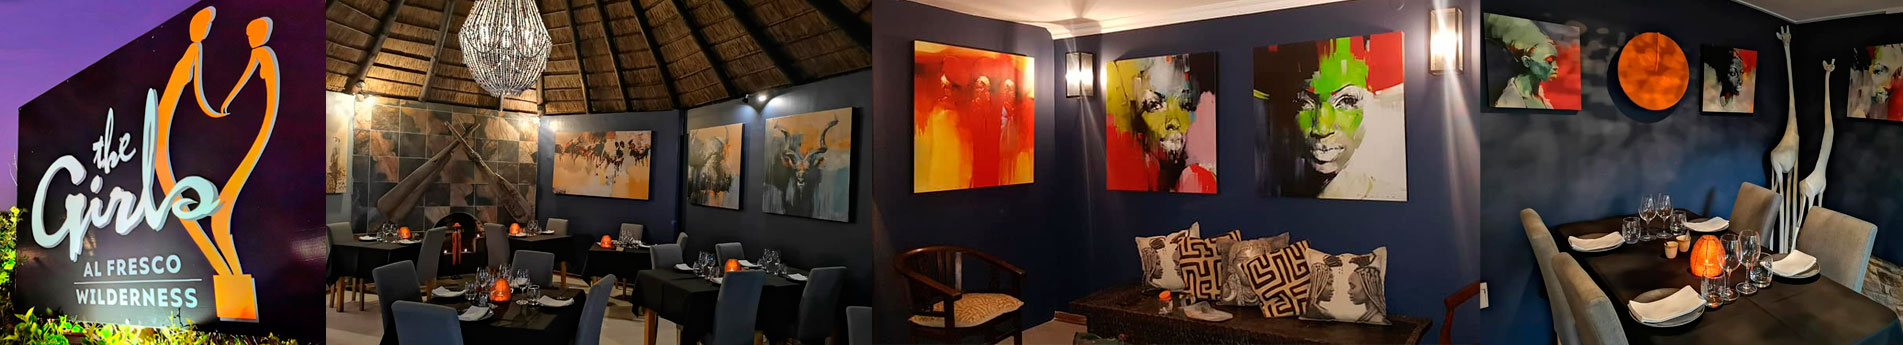 Peter Pharoah artworks at The rebirth of elegance at the Girls Restaurant in Wilderness